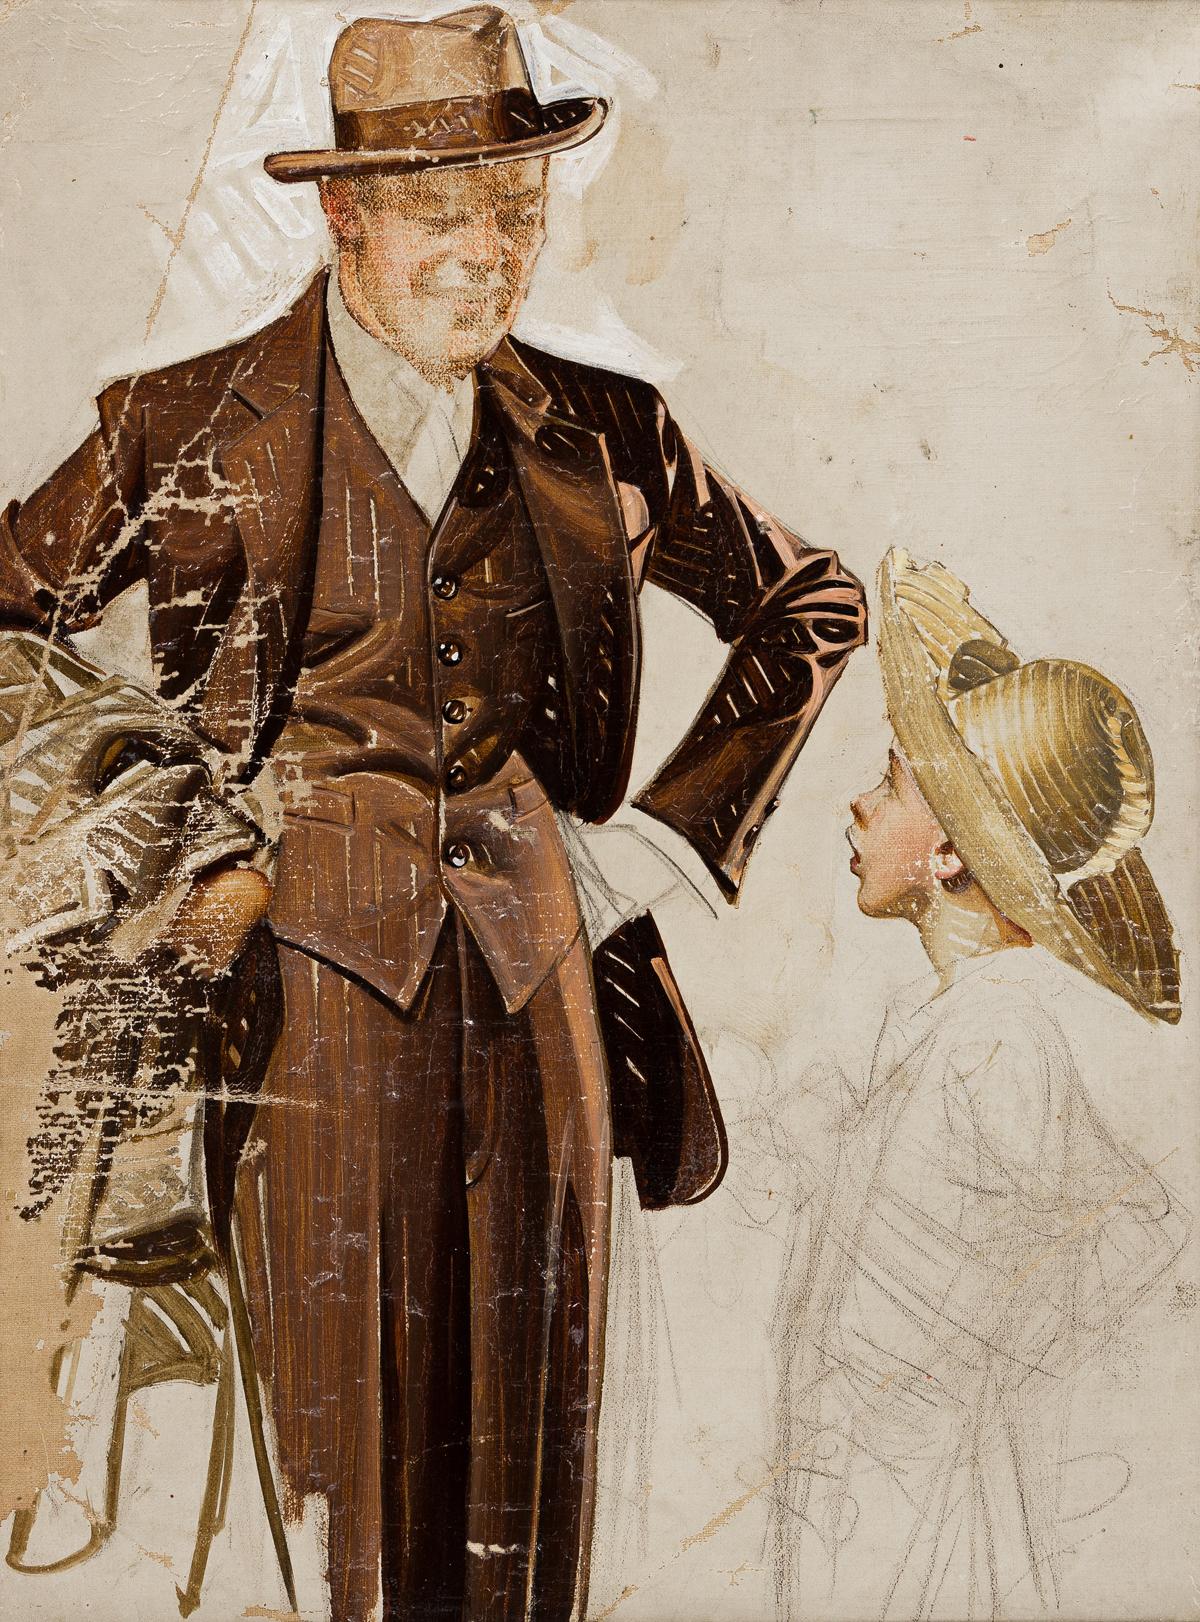 JOSEPH CHRISTIAN LEYENDECKER (1874-1951) Kuppenheimer clothing advertisement study. [ADVERTISING / MENS FASHION]